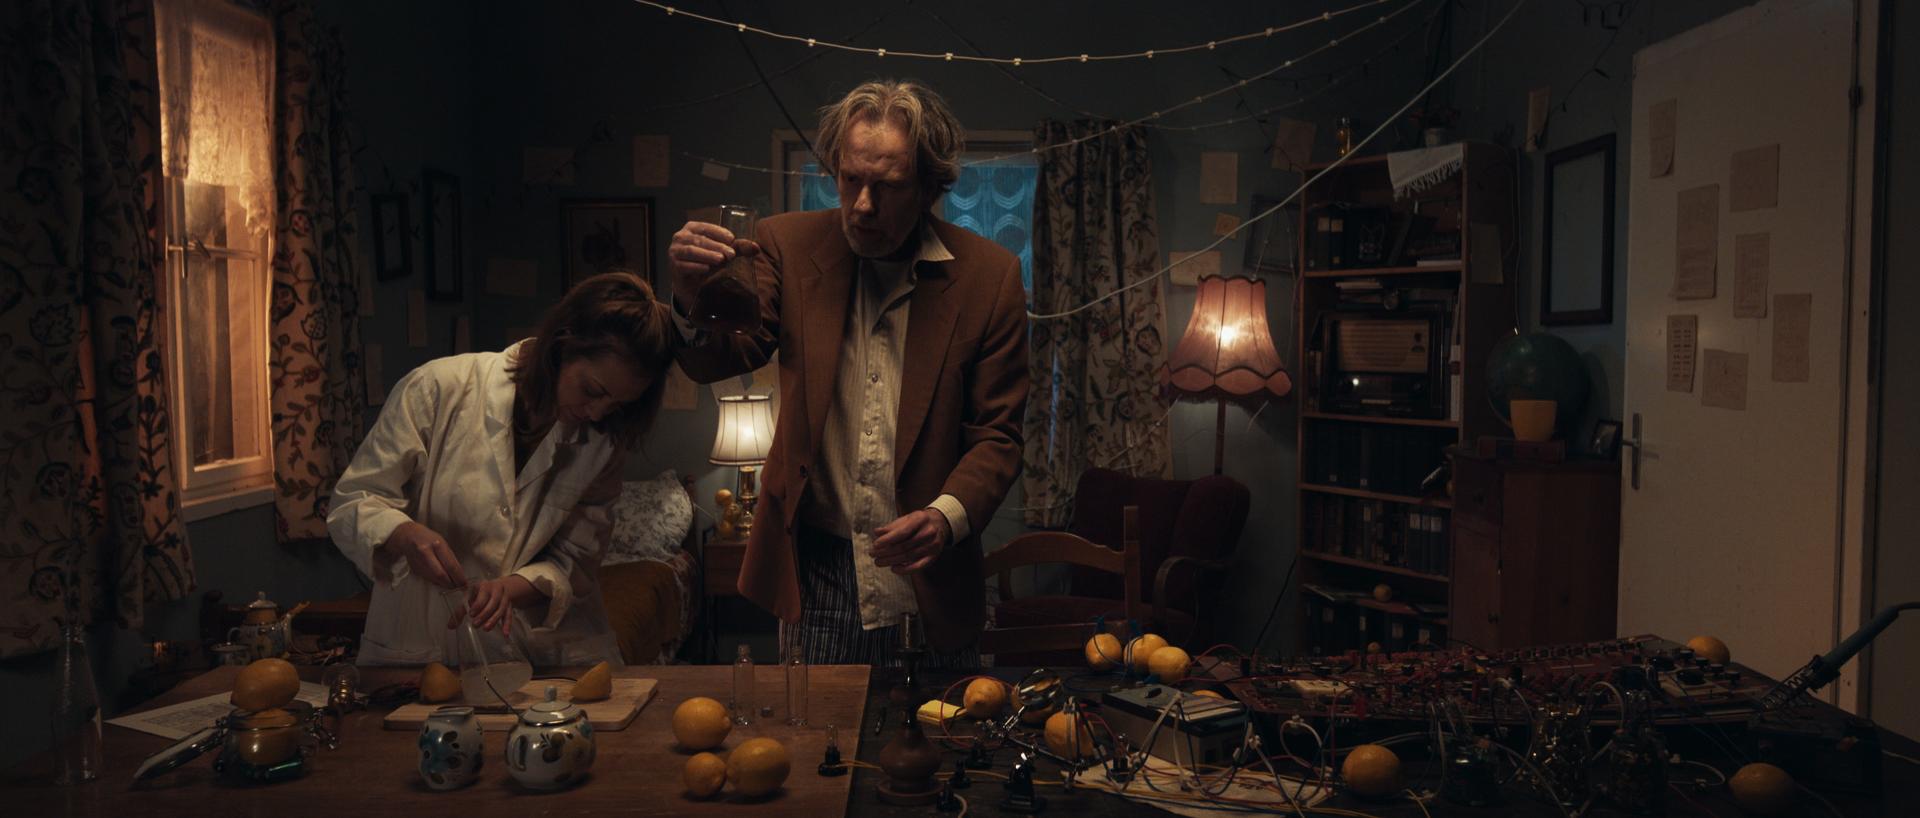 «When Life gives you Lemons» | Fictional Short | D: Linda Krauss & Sam Handel